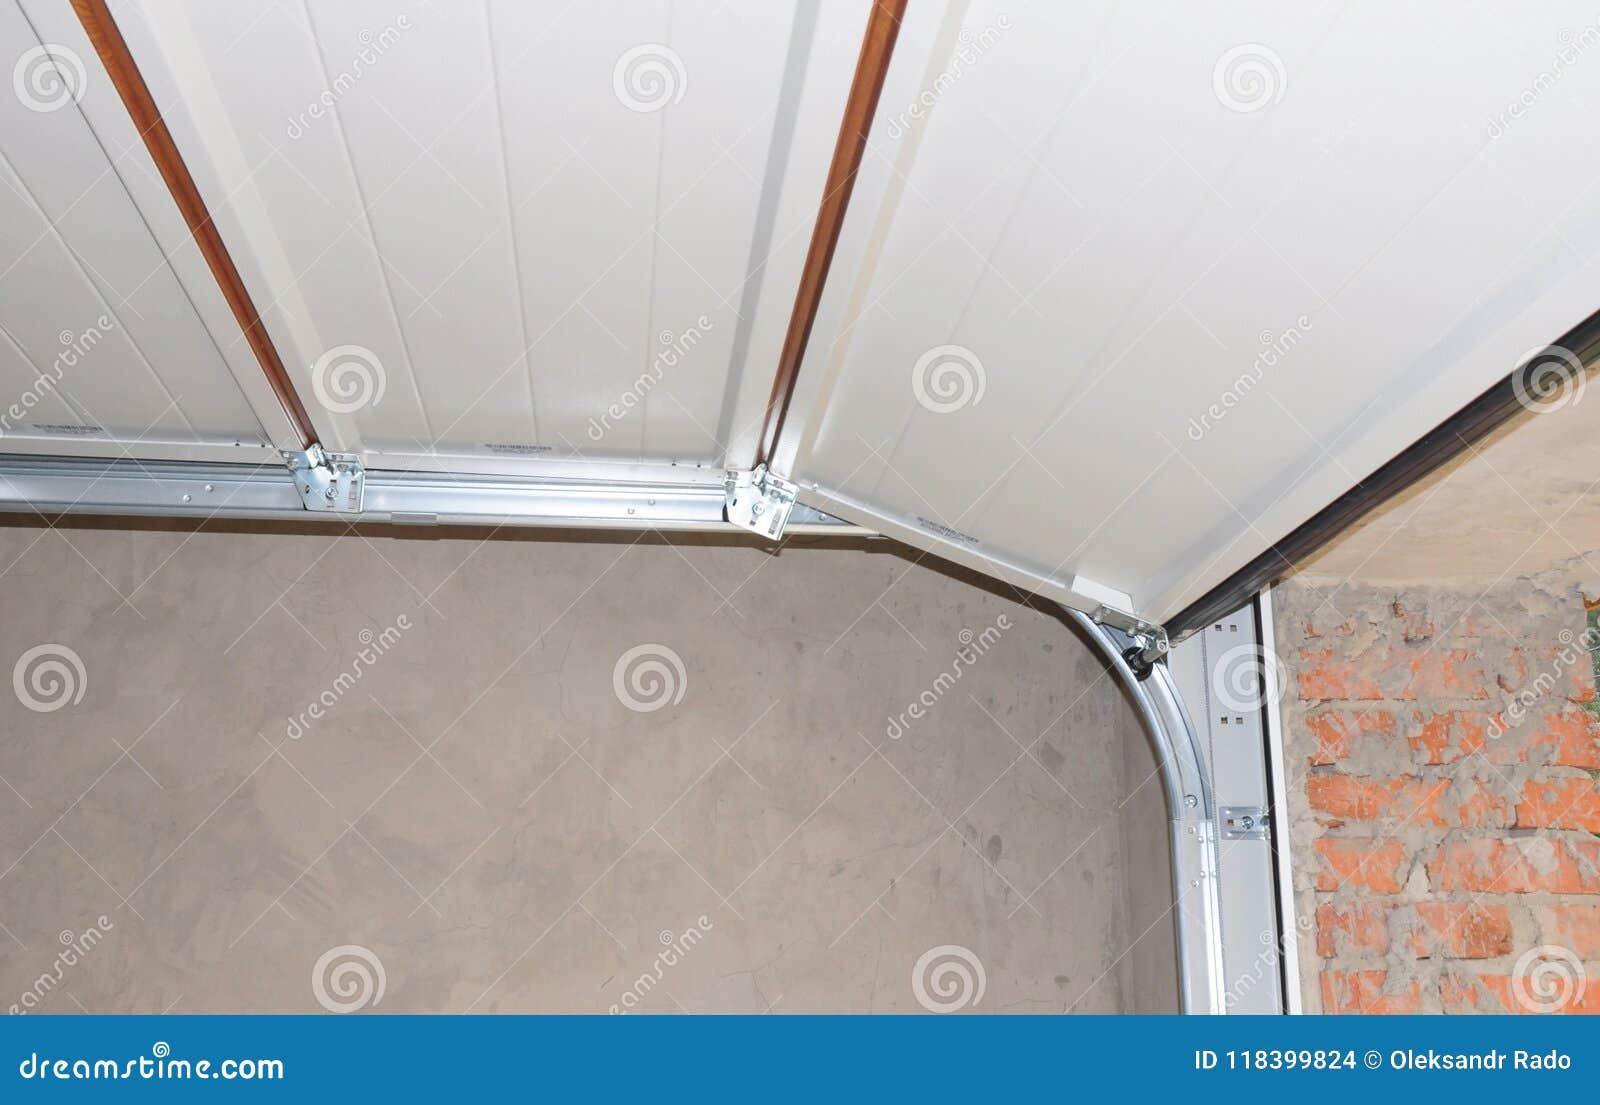 Installing And Repair Garage Door Opener And Lifting System Stock